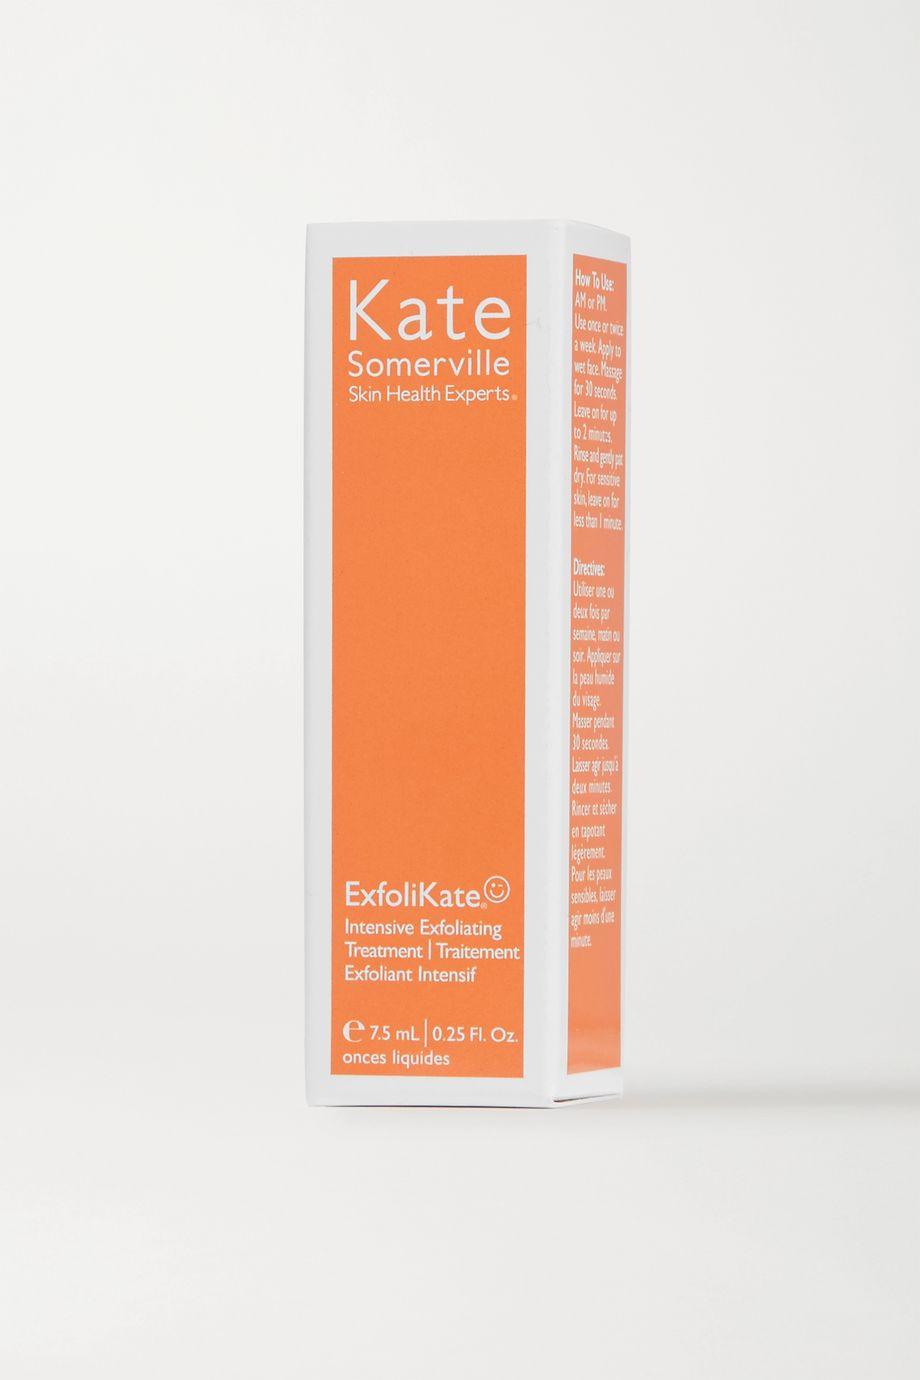 Kate Somerville Traitement exfoliant intensif ExfoliKate, 15 ml